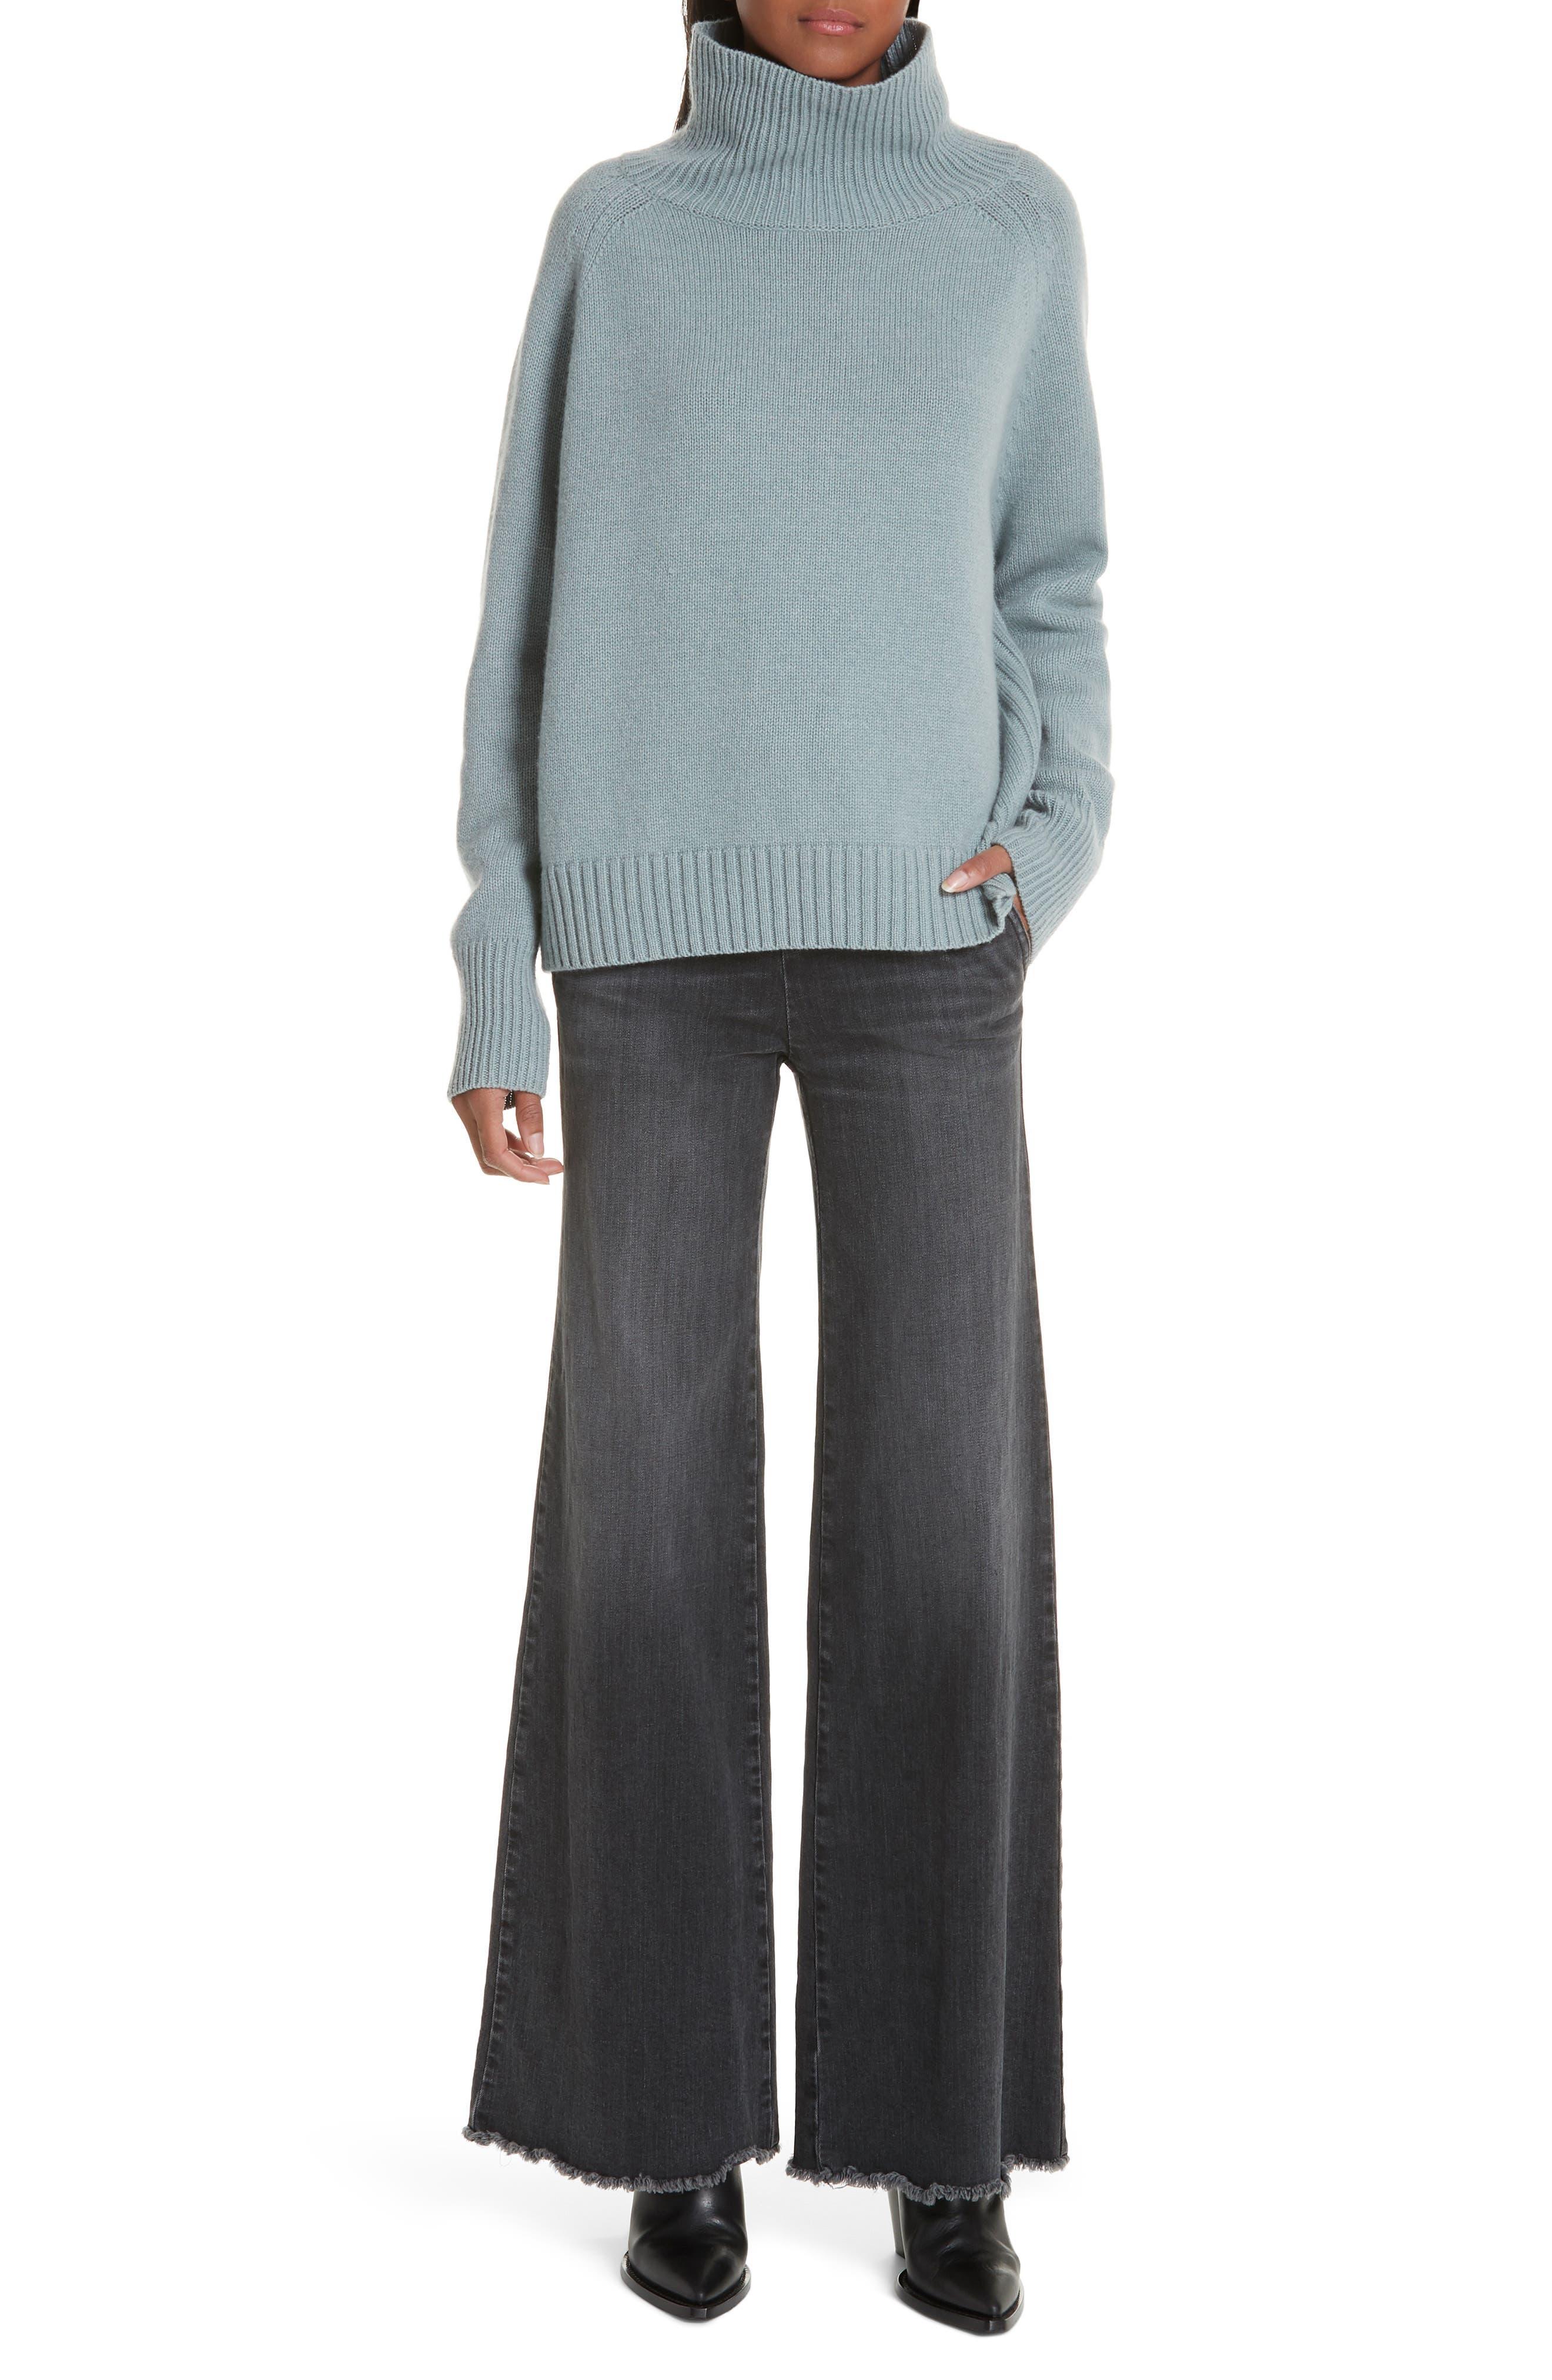 NILI LOTAN, Mariah Funnel Neck Cashmere Sweater, Alternate thumbnail 7, color, SKY BLUE